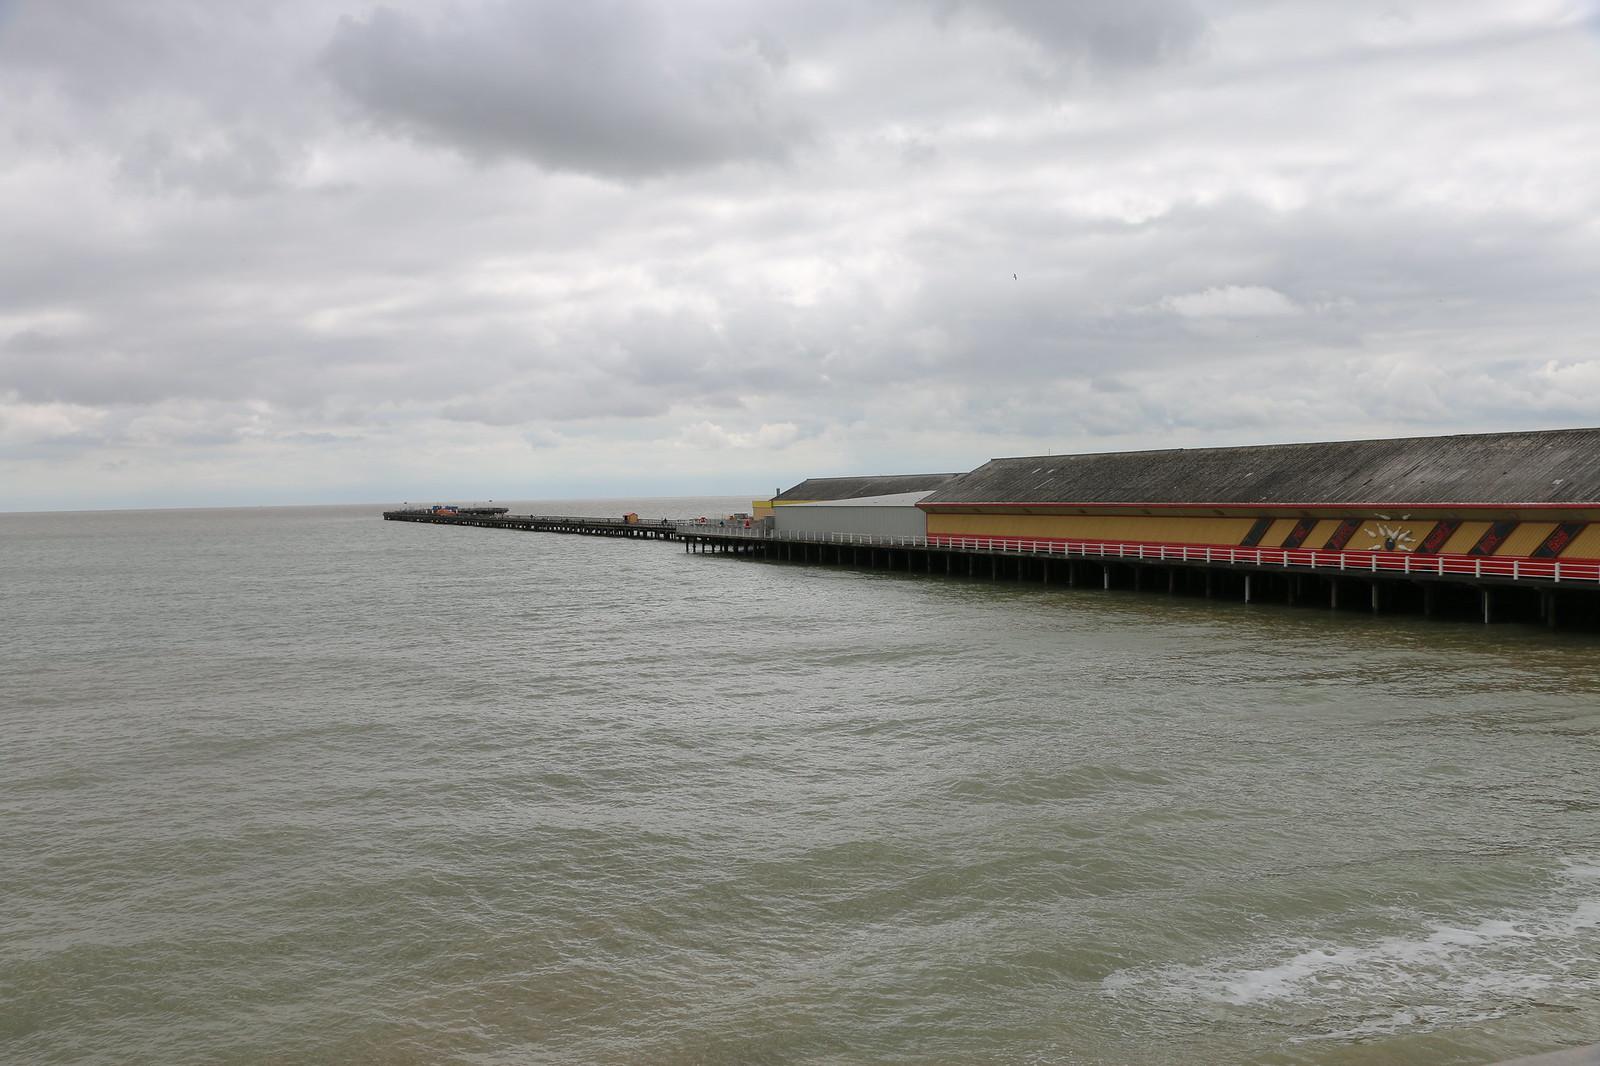 Walton-on-the-Naze Pier